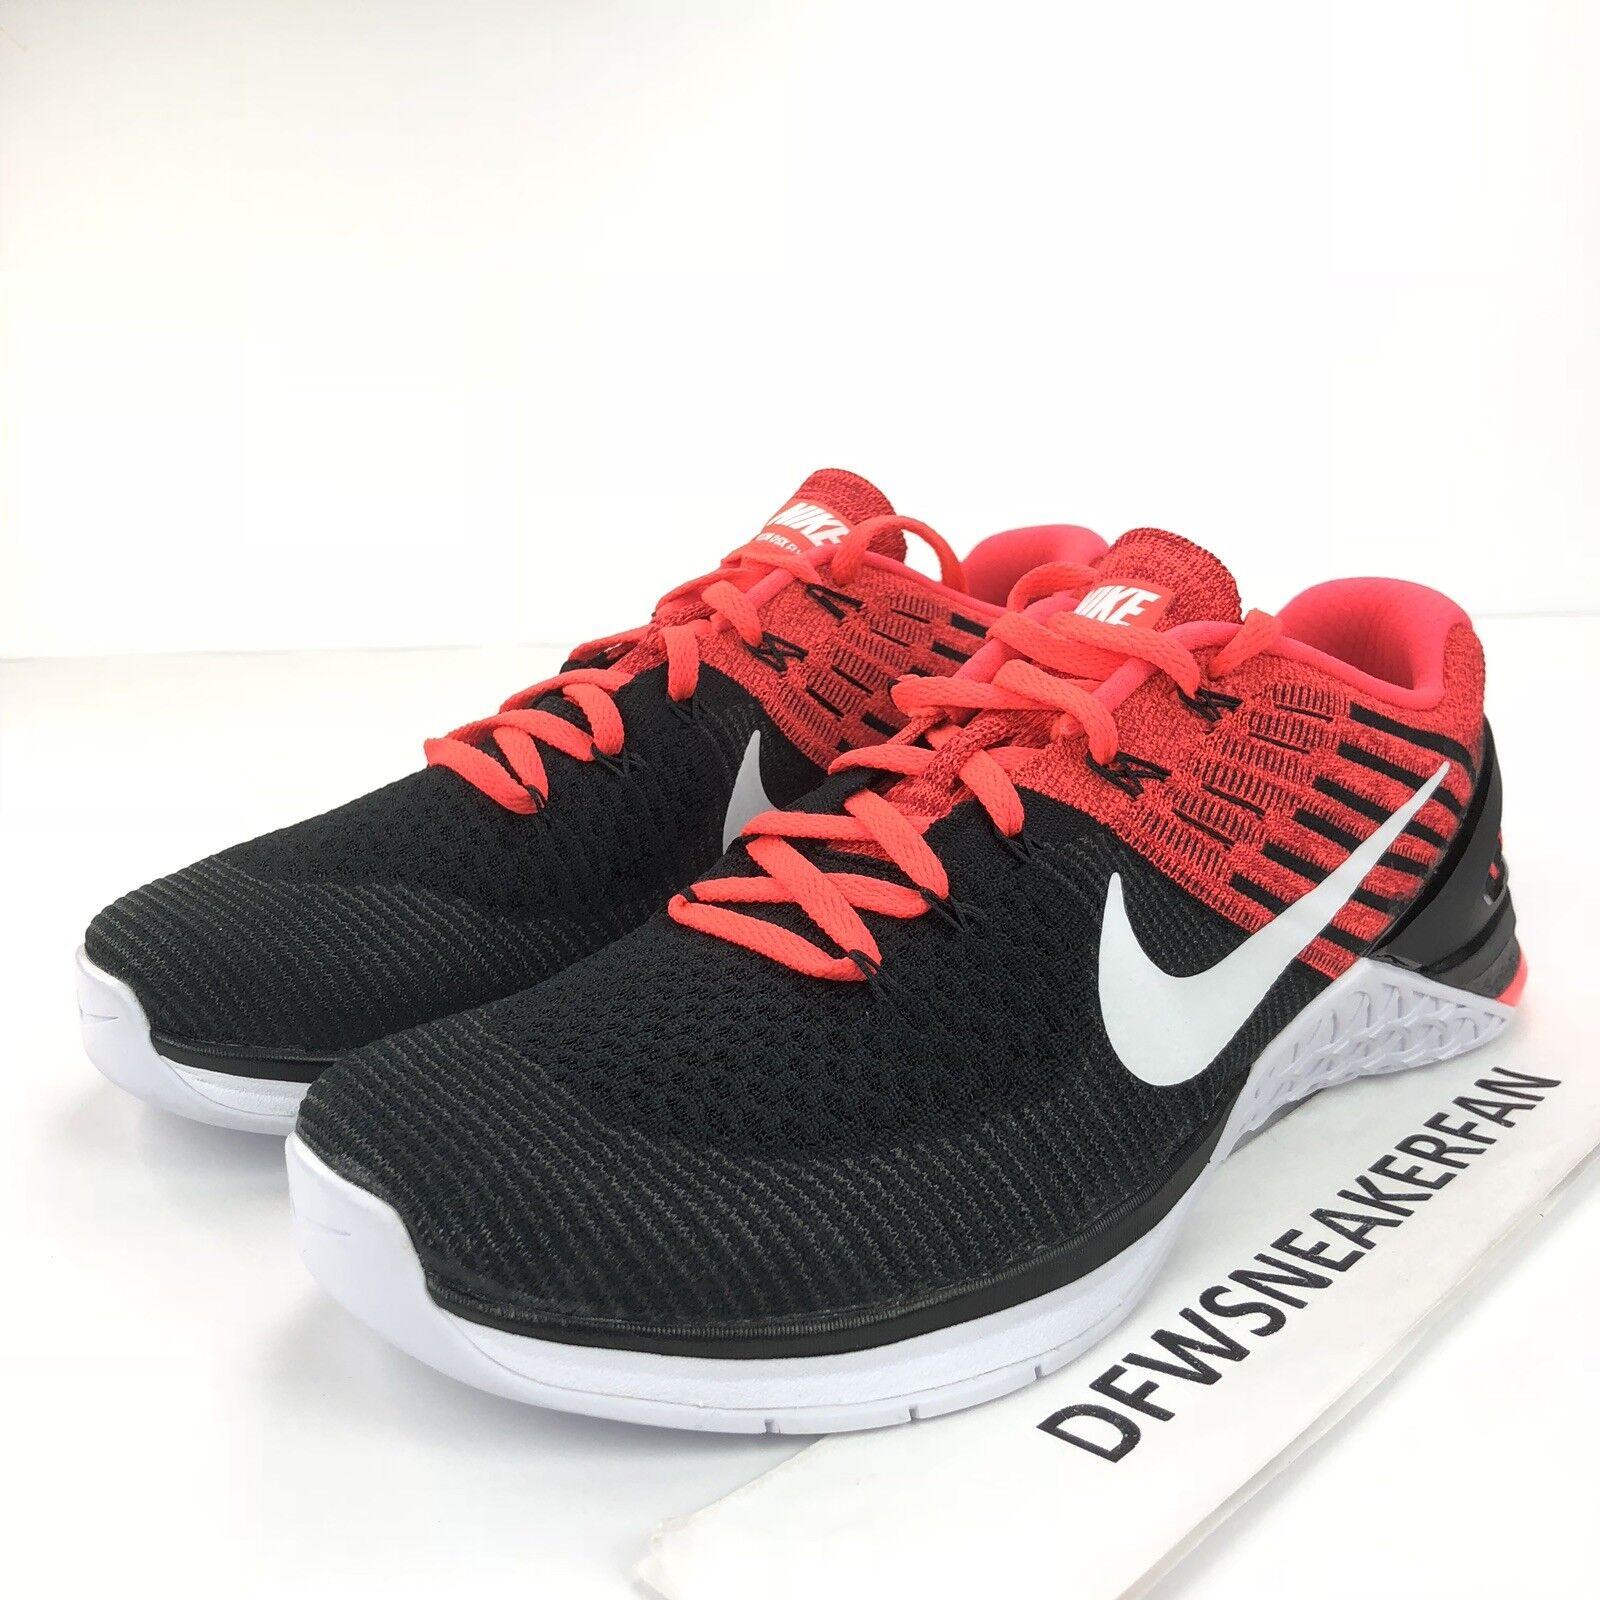 Nike Metcon DSX Flyknit Training shoes Men's Size 9 Crimson Black 852930 009 New